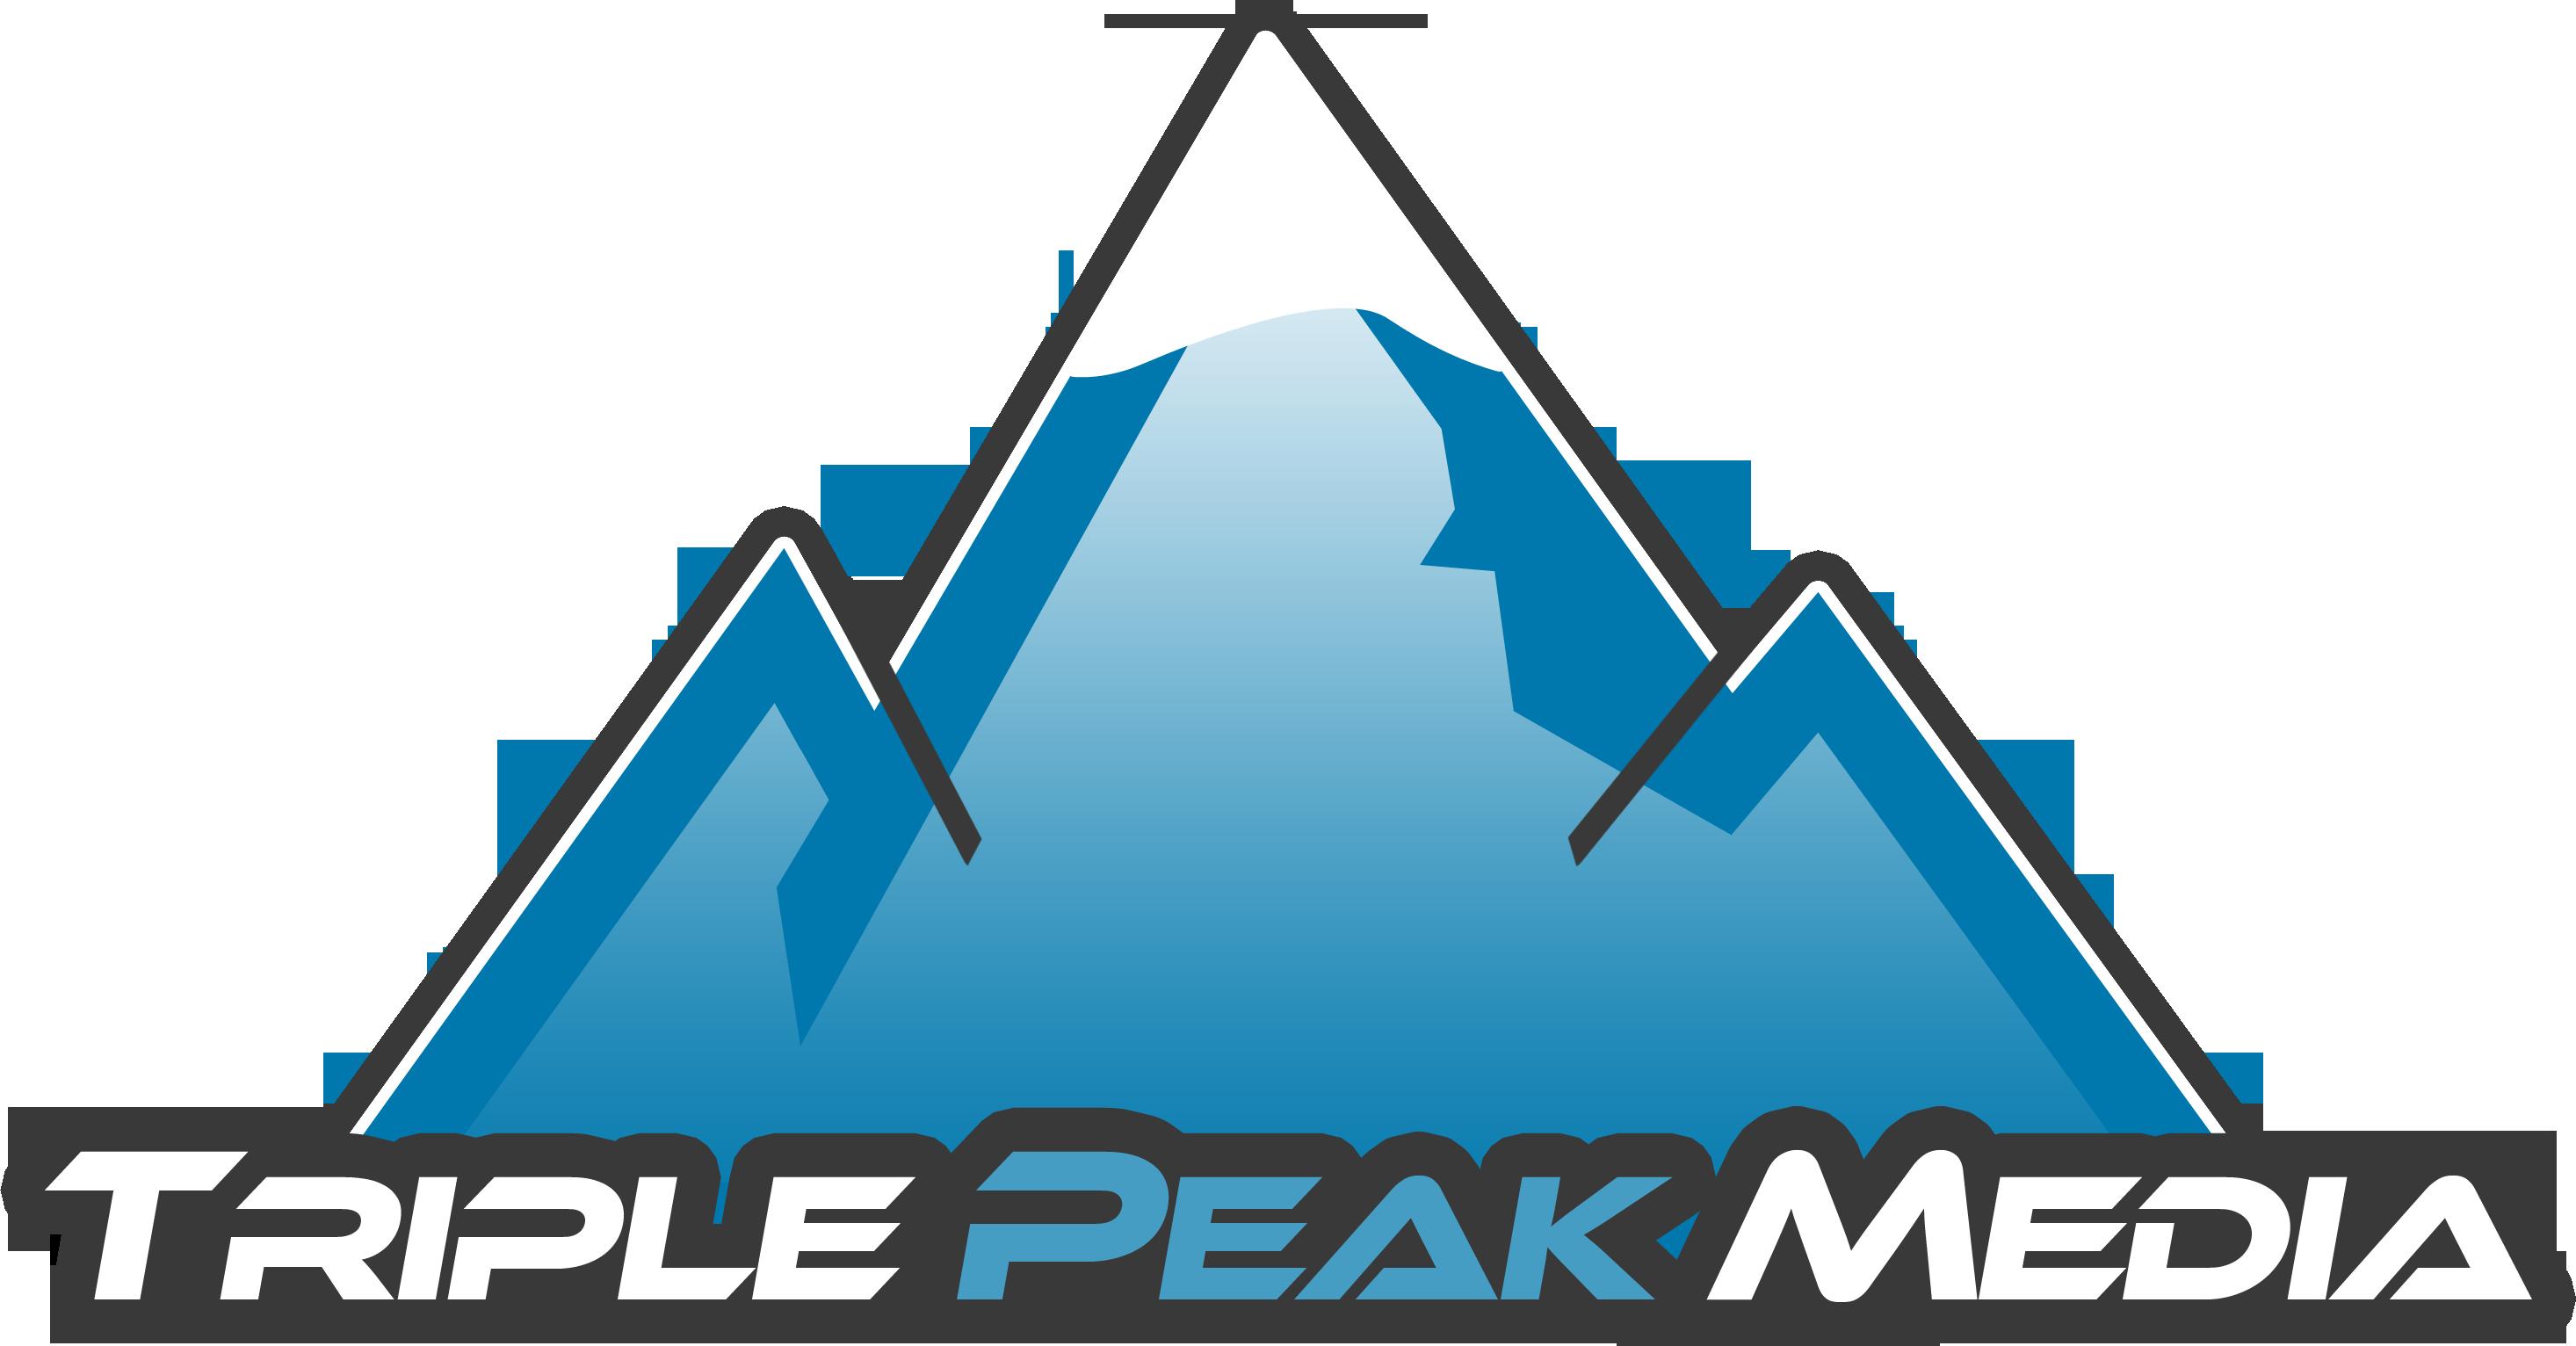 Logo panda free images. Mountain clipart mountain peak